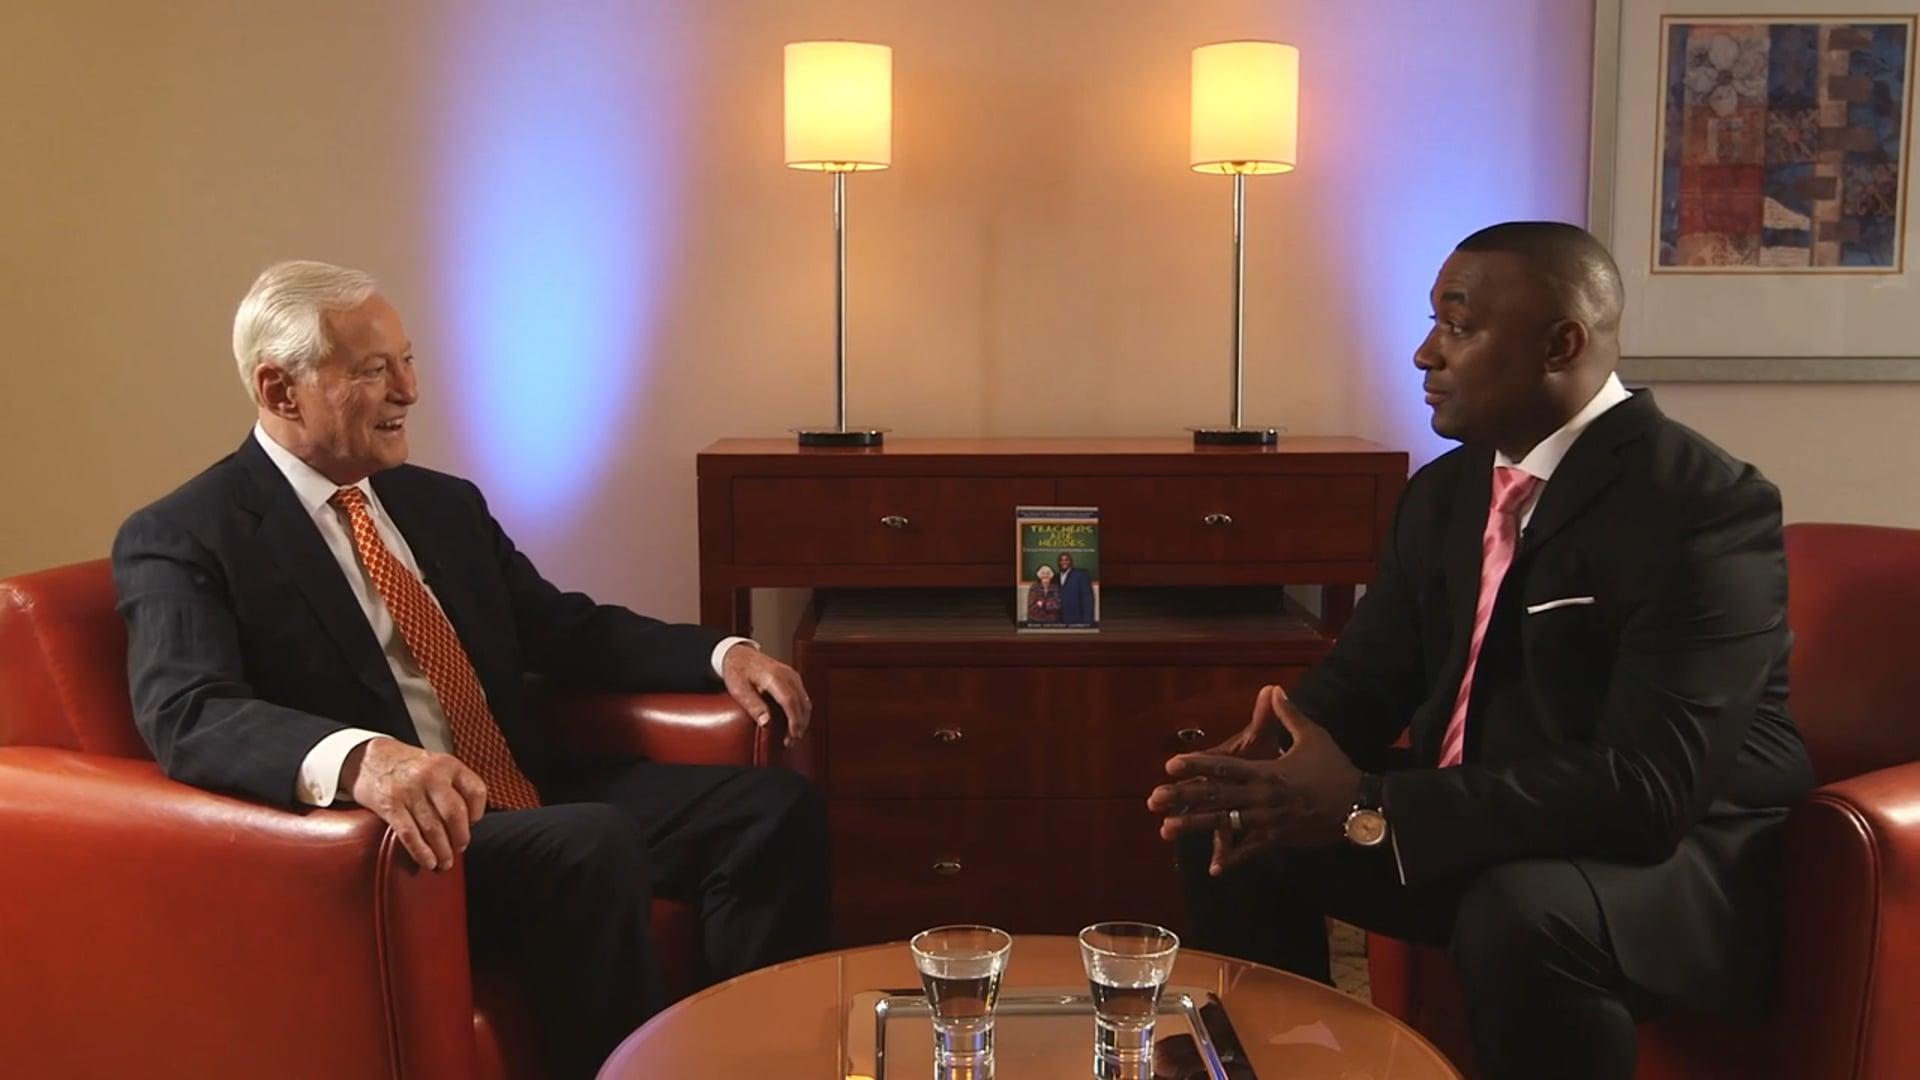 Brian Tracy Interviews Mark Anthony Garrett